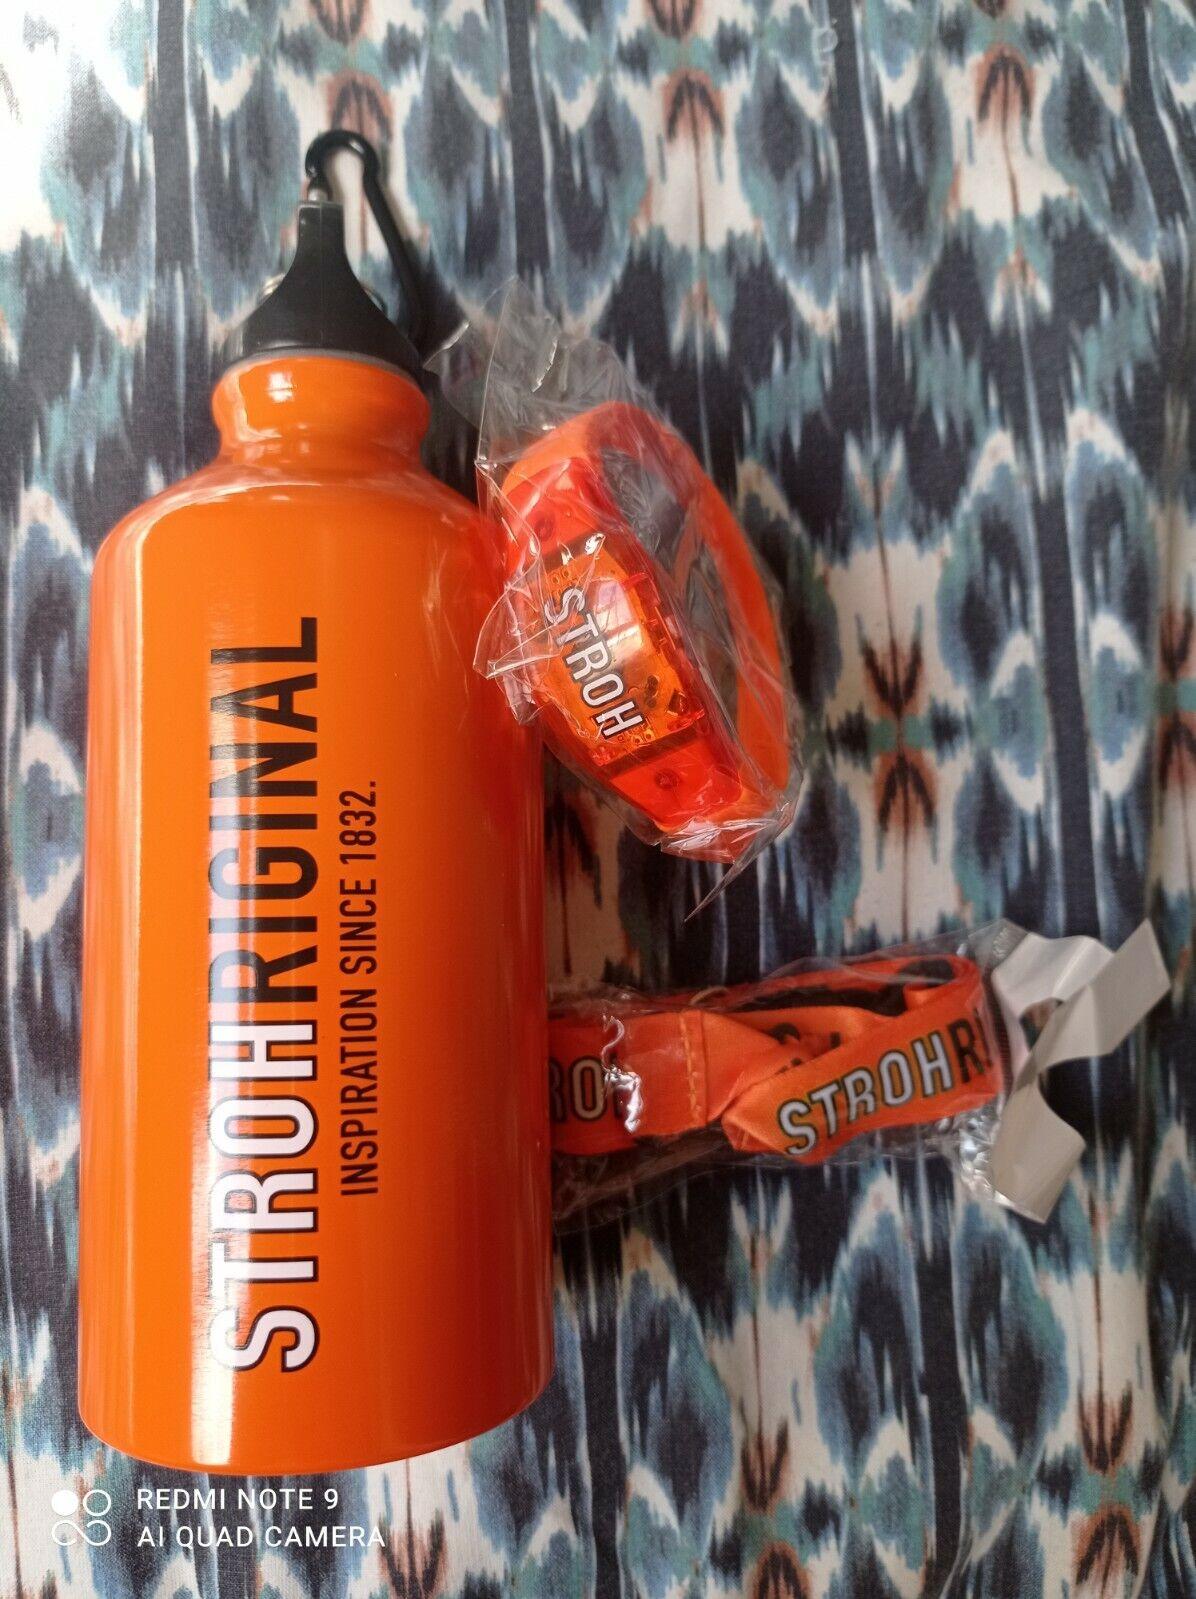 Lanyard, Bracelet, Bottle 500ml. for Sport, Hiking or for a Present